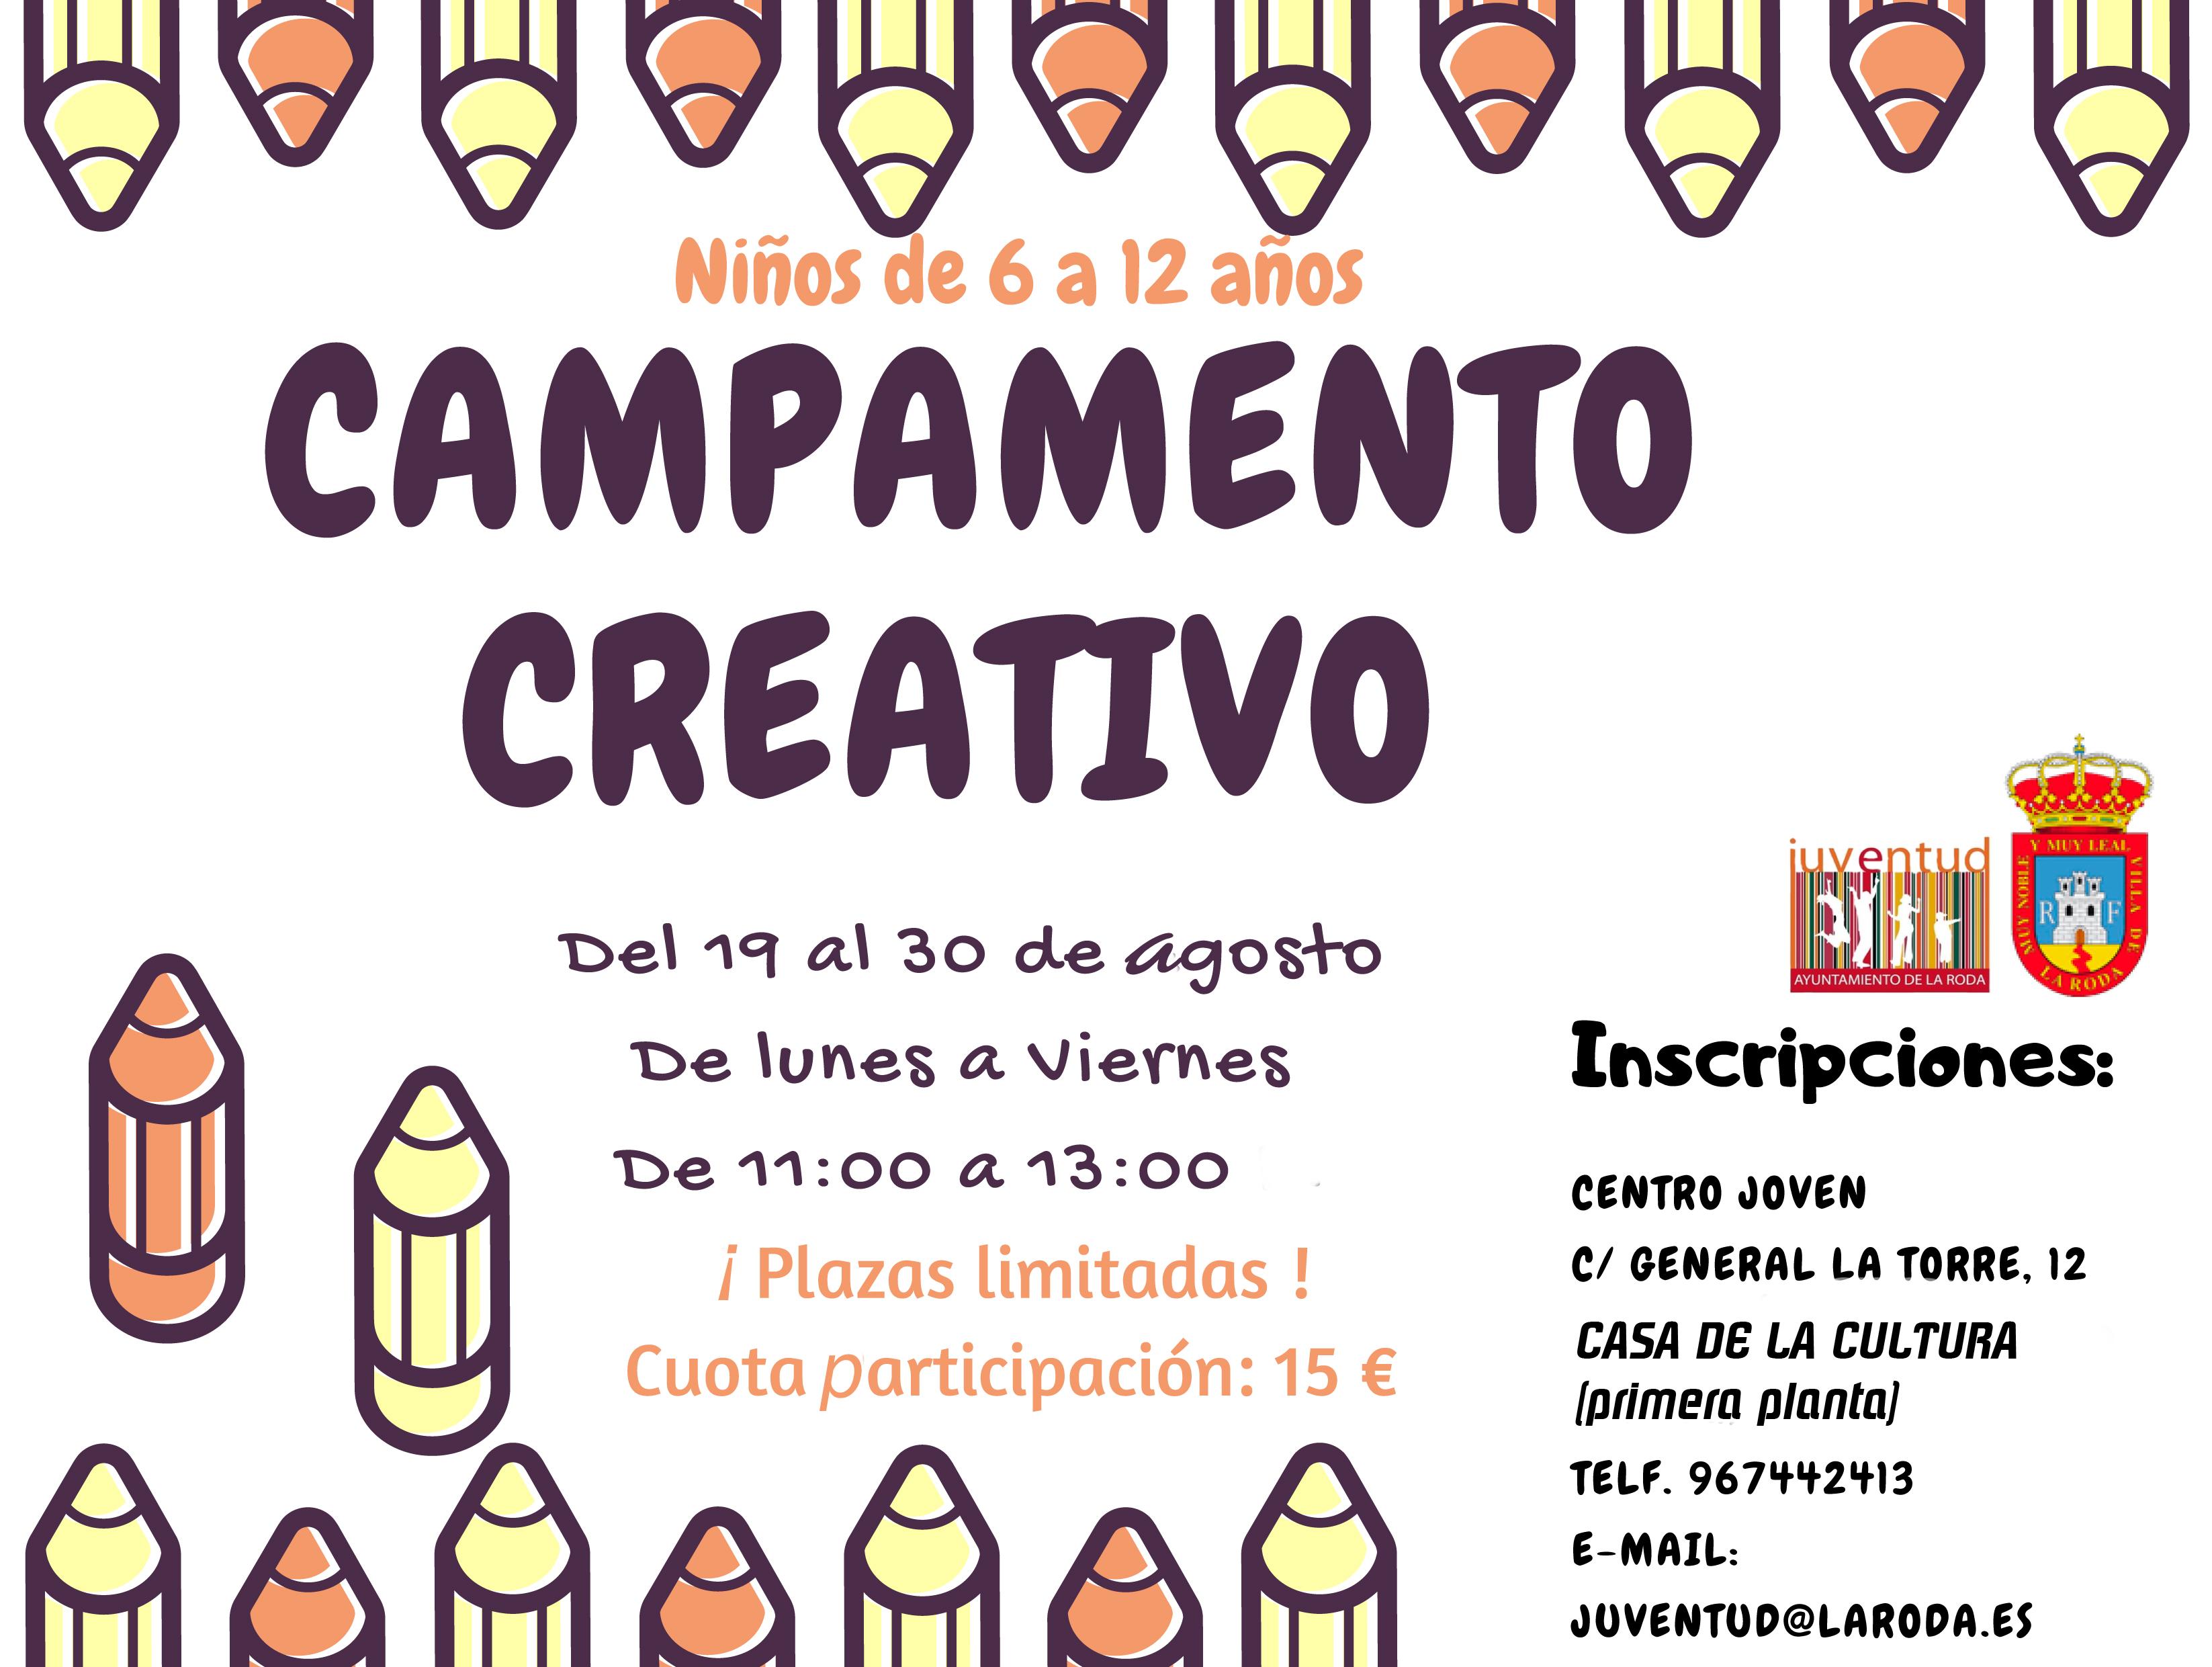 Campamento Creativo